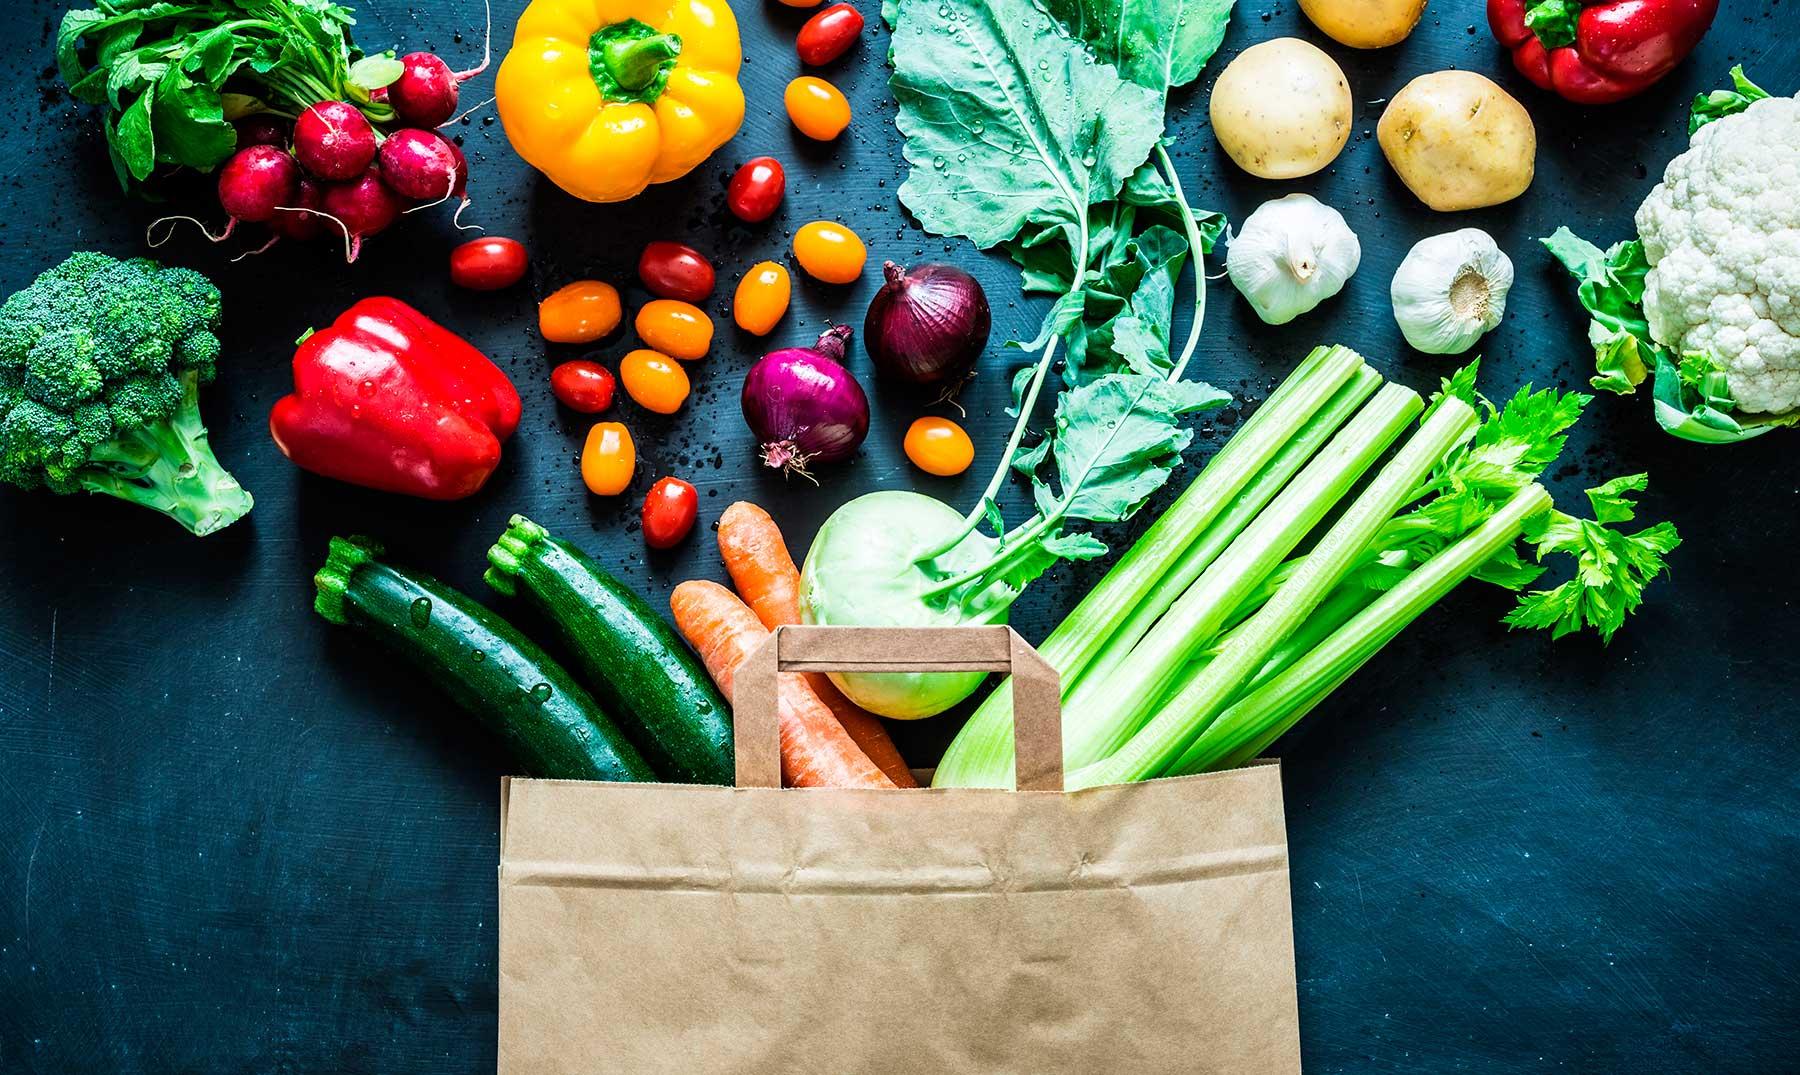 Alimentos ecológicos | 5 Beneficios que debes conocer